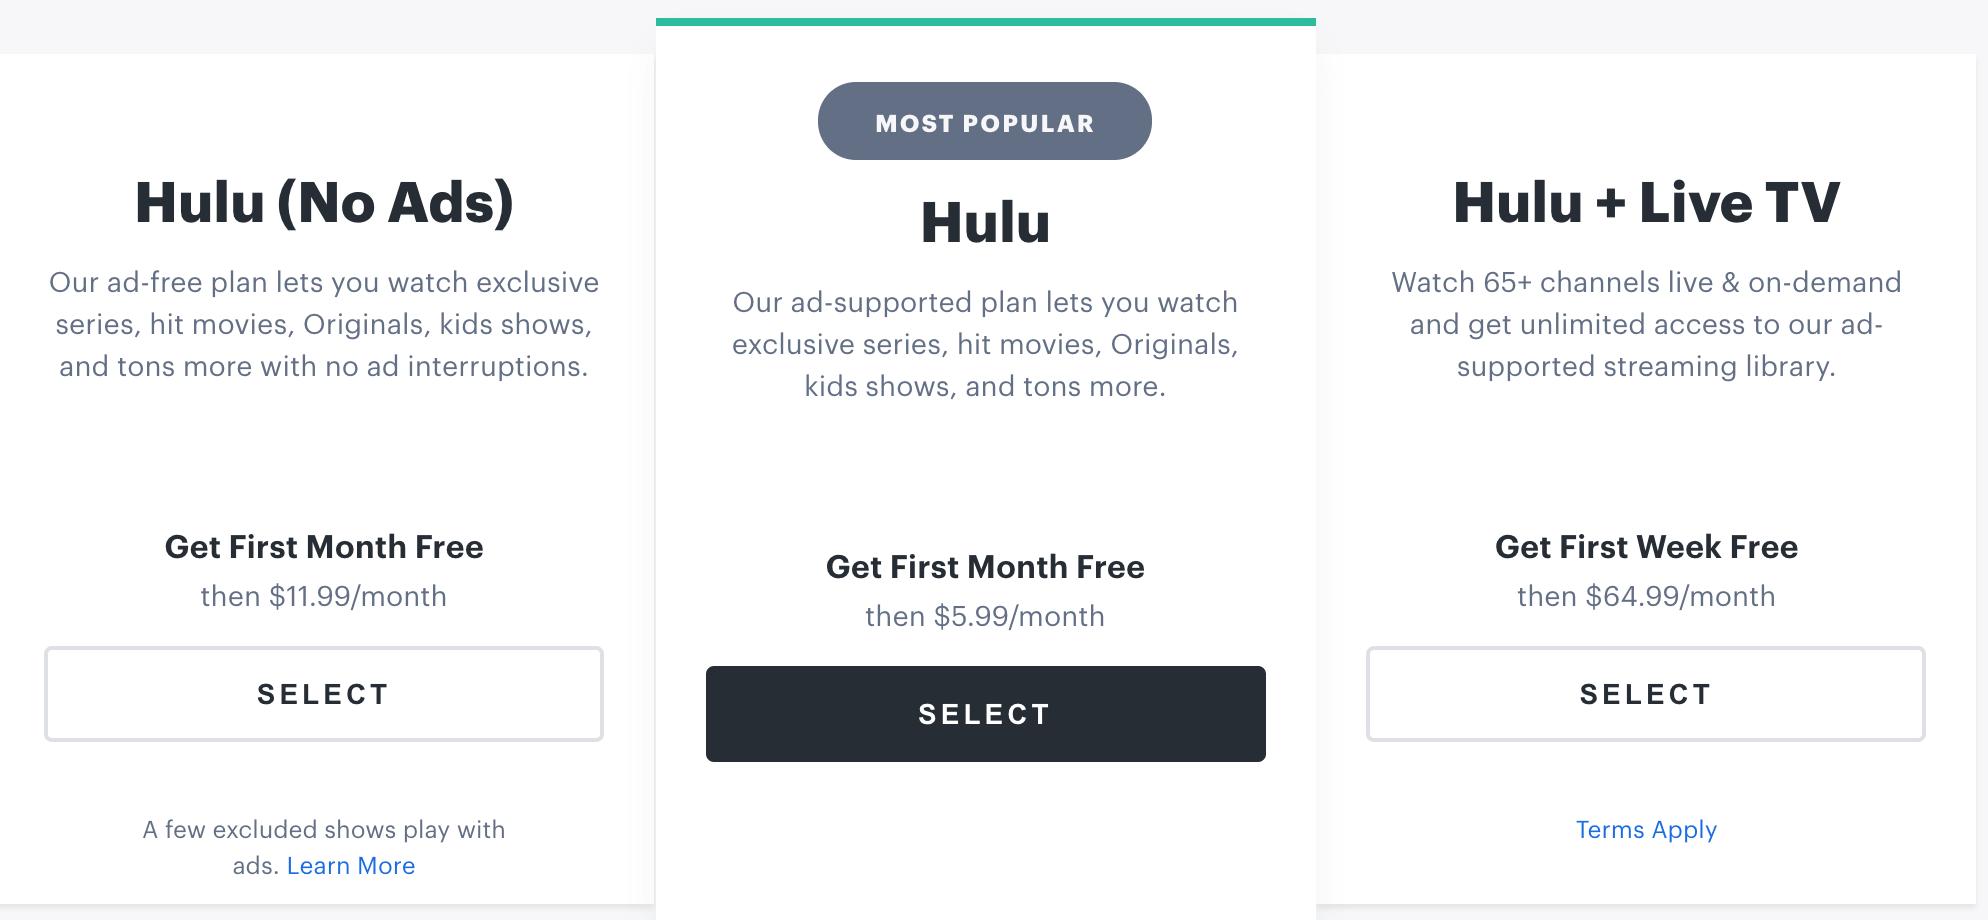 Hulu Plans